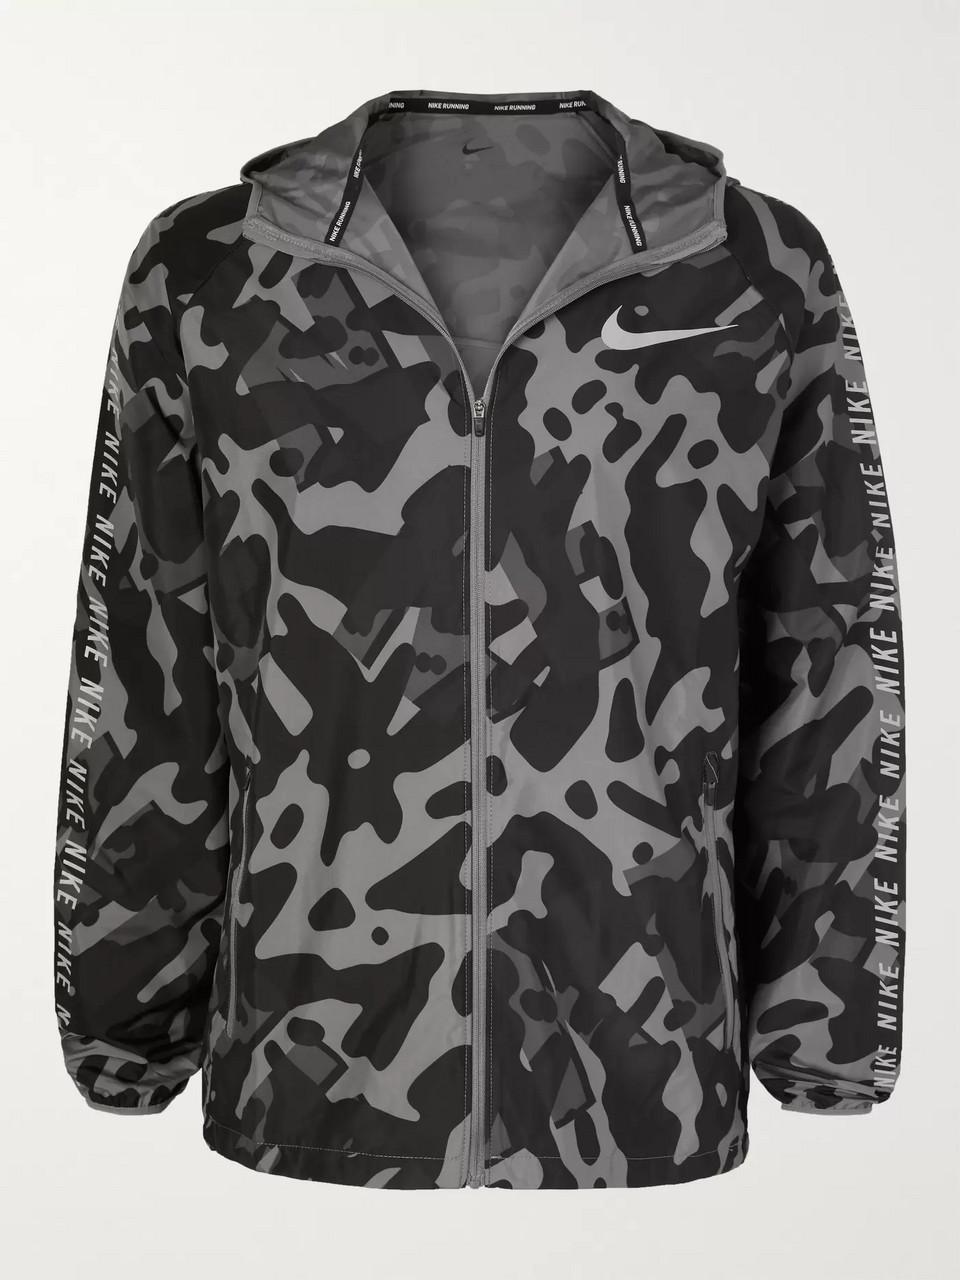 3cac88e99d174 Black Camouflage-Print Shell Hooded Jacket | Nike Running | MR PORTER